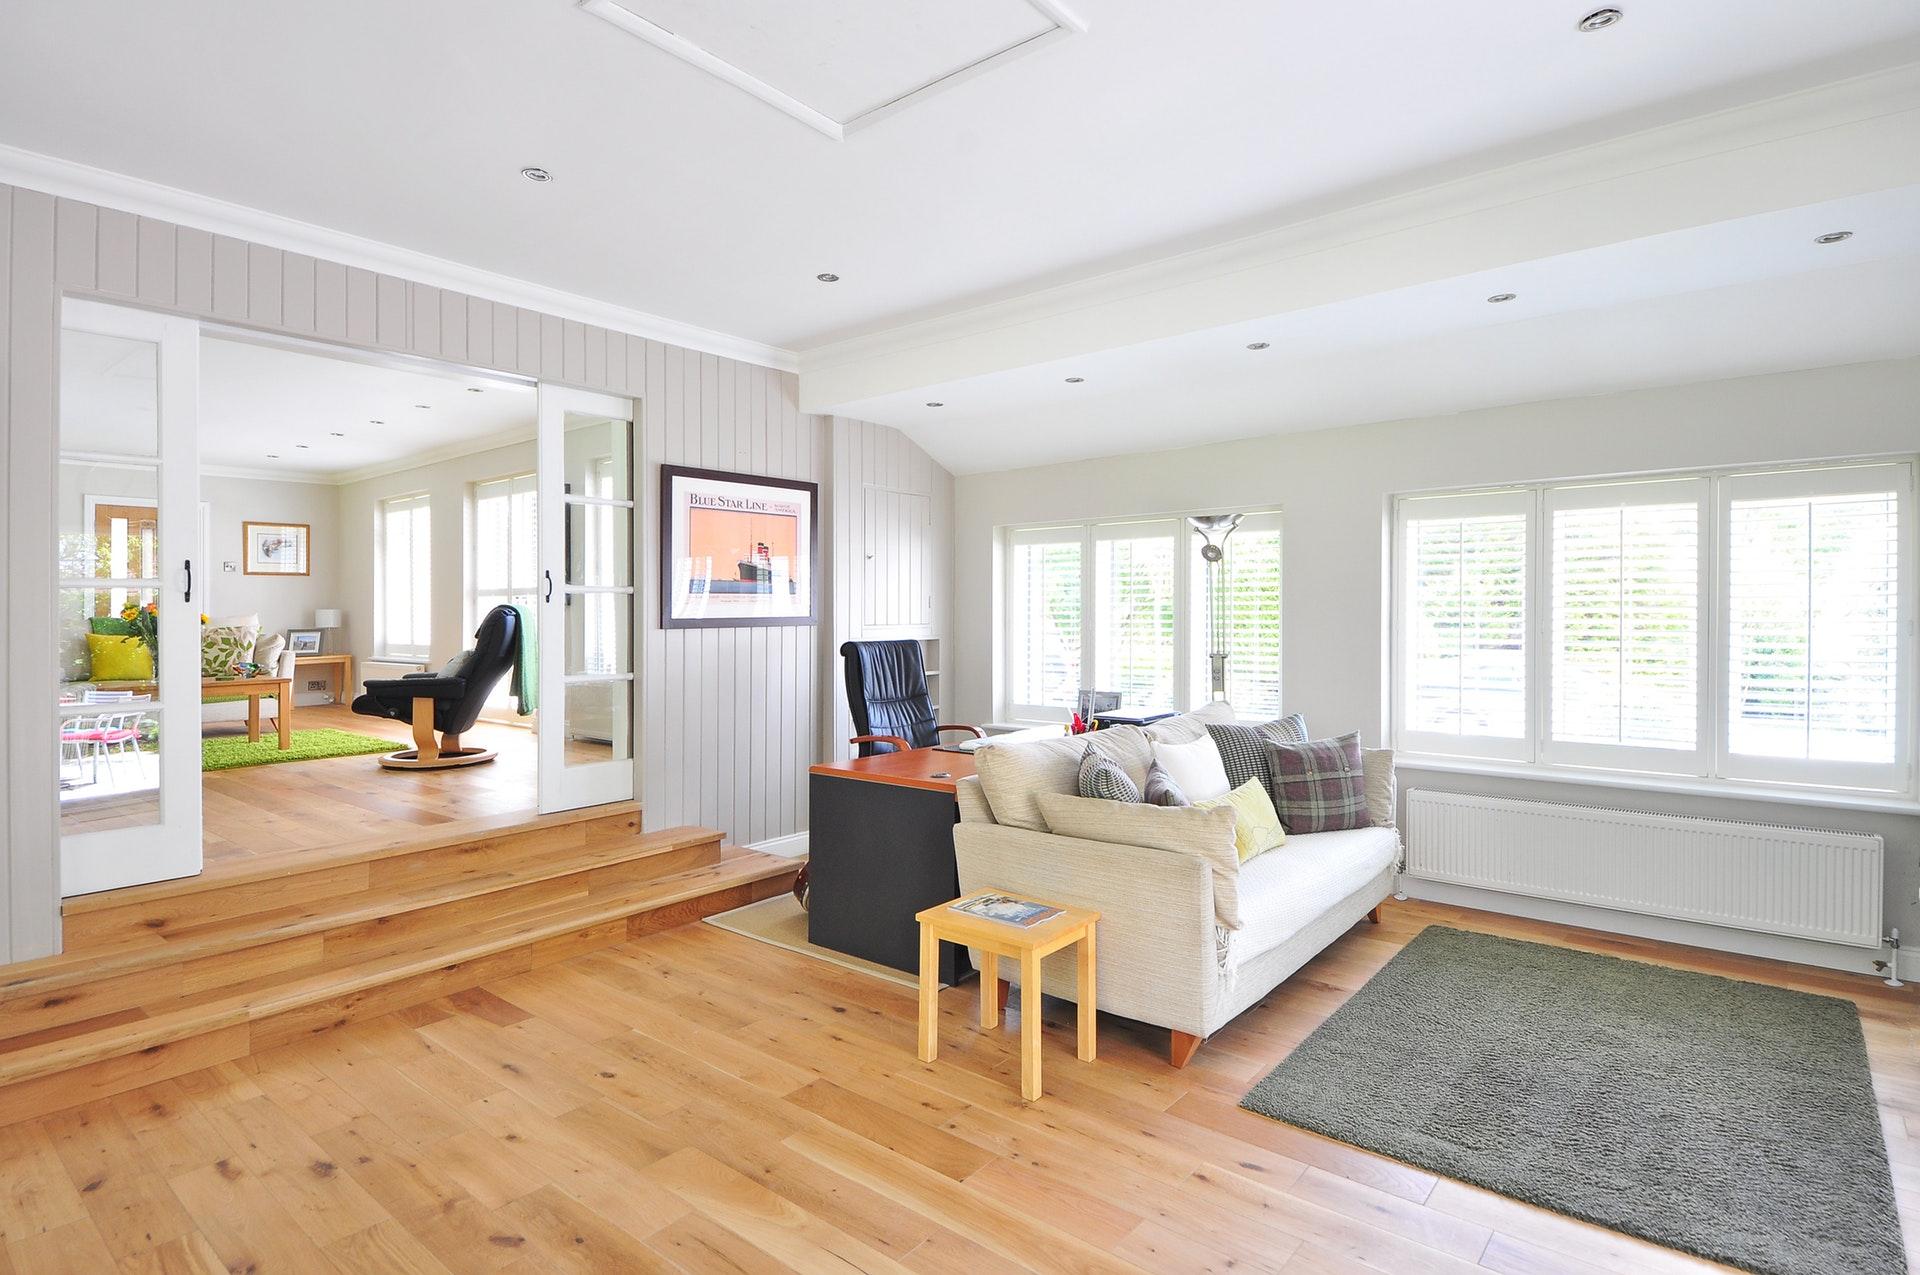 5 Farmhouse Design Ideas And Tips